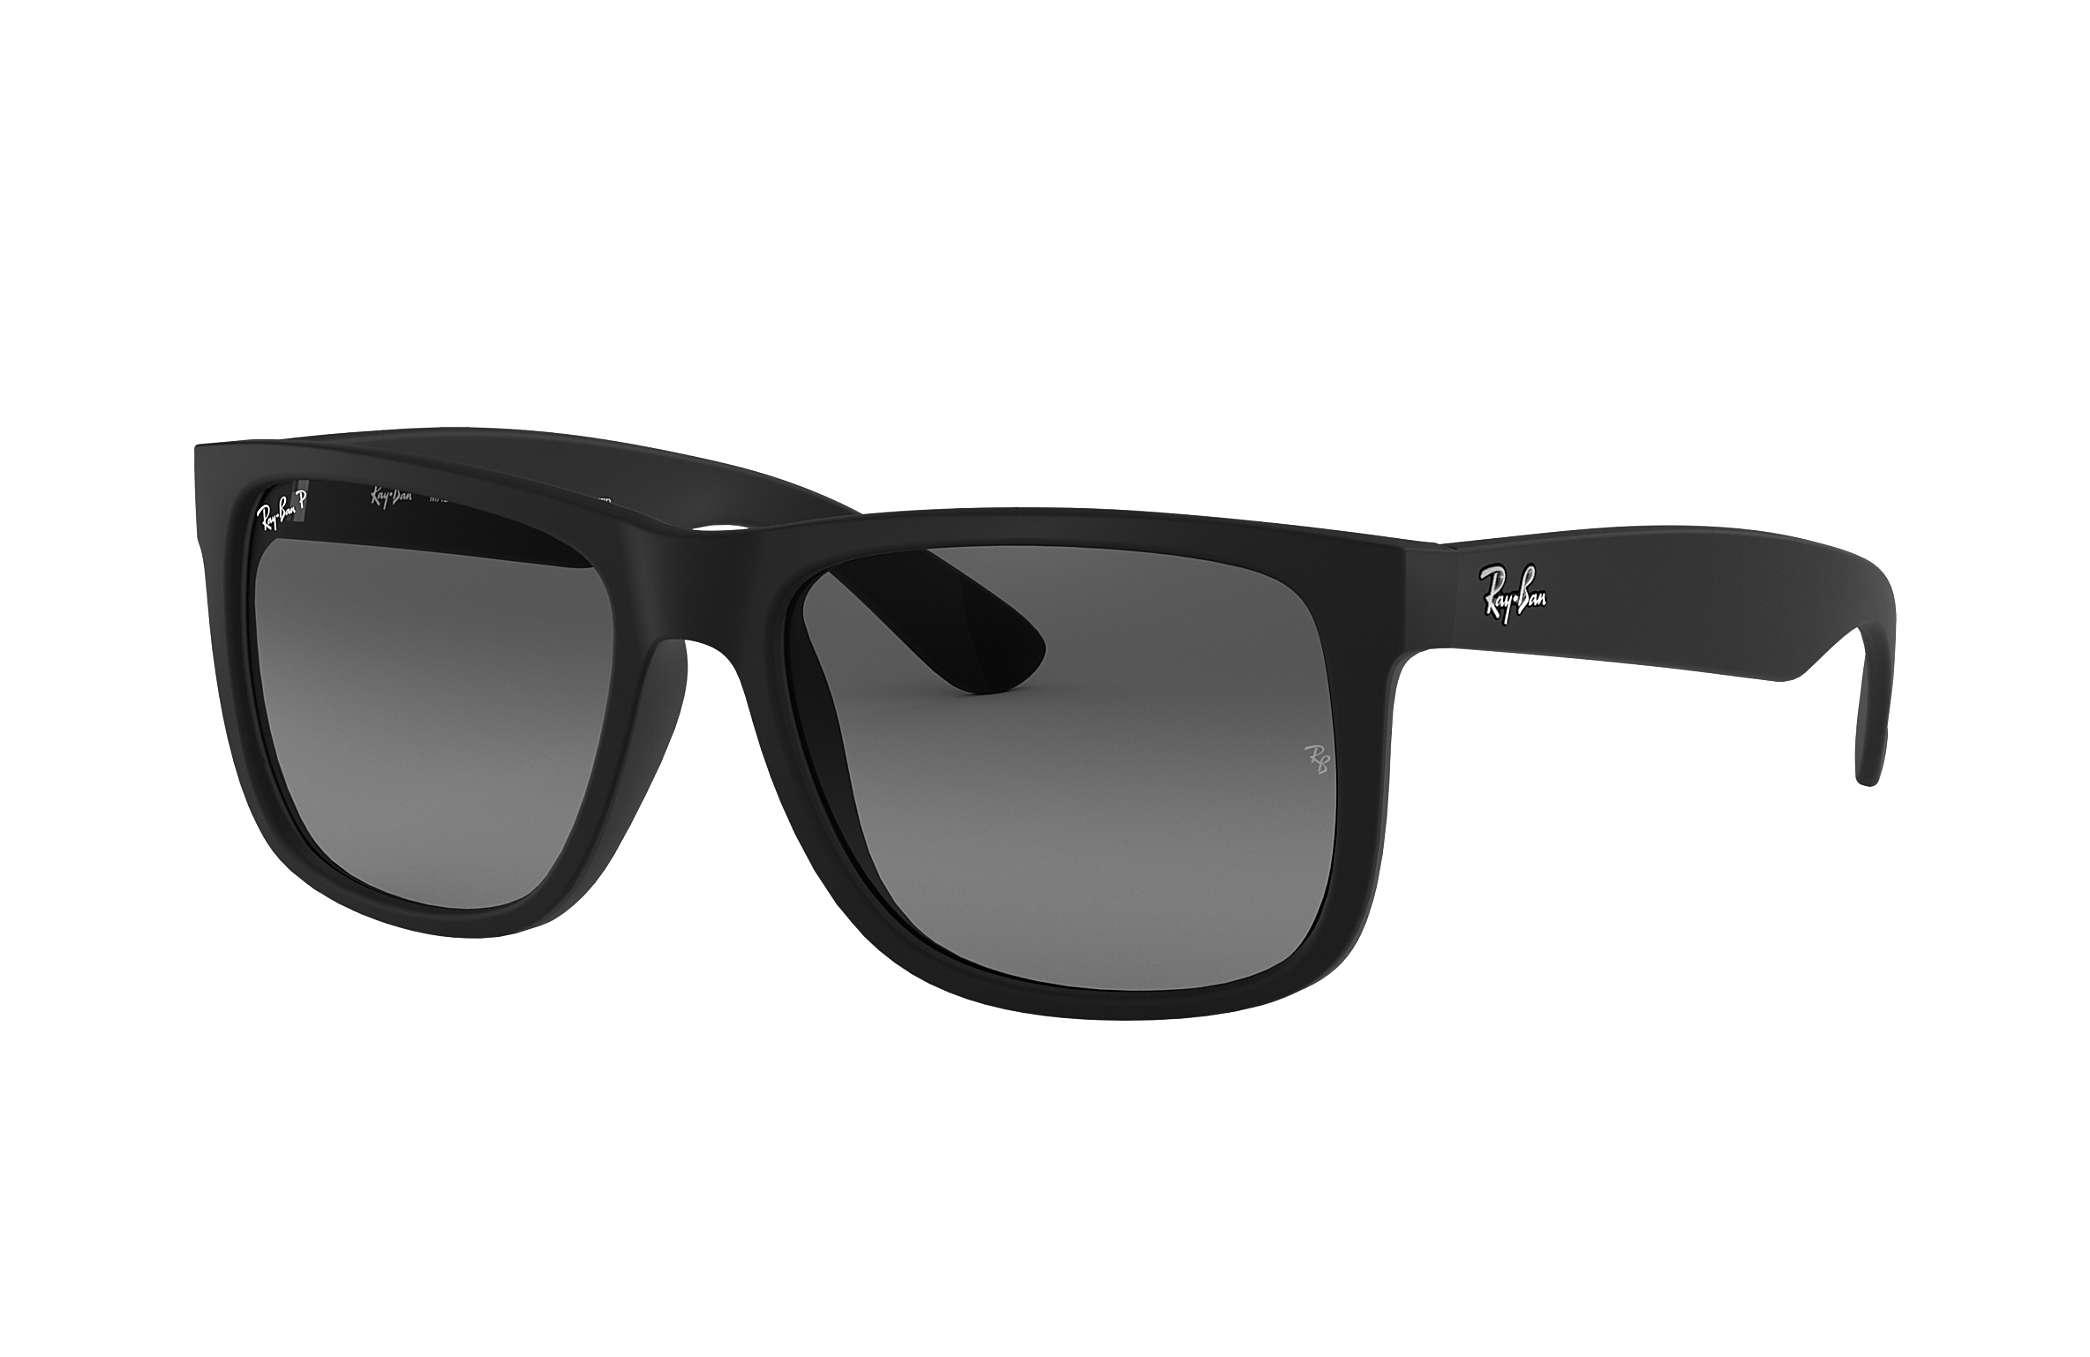 Óculos de sol Justin  a coleção   Ray-Ban® Brasil 5f47b47315